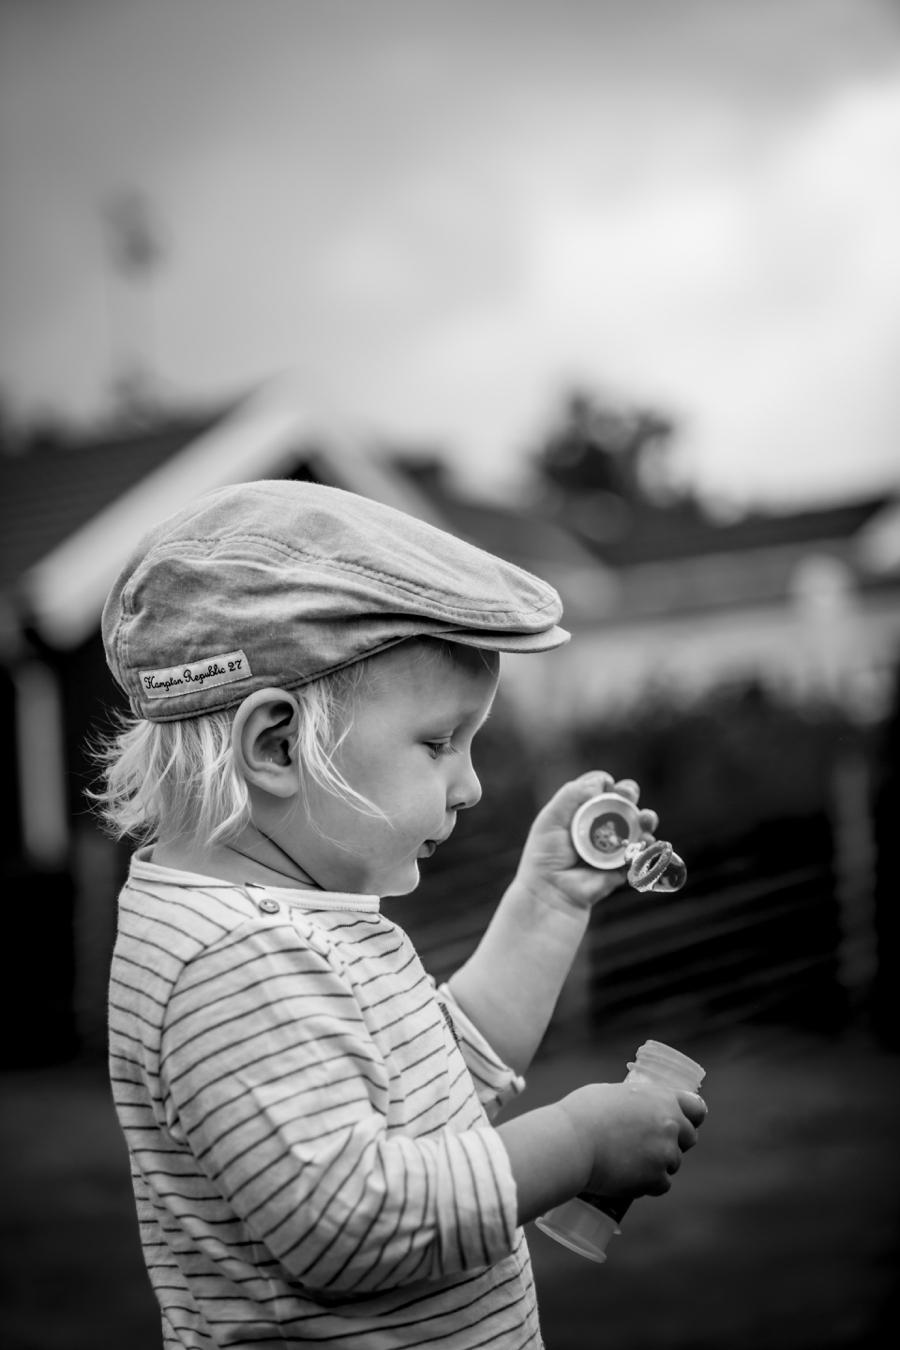 bra pris barnfotografering